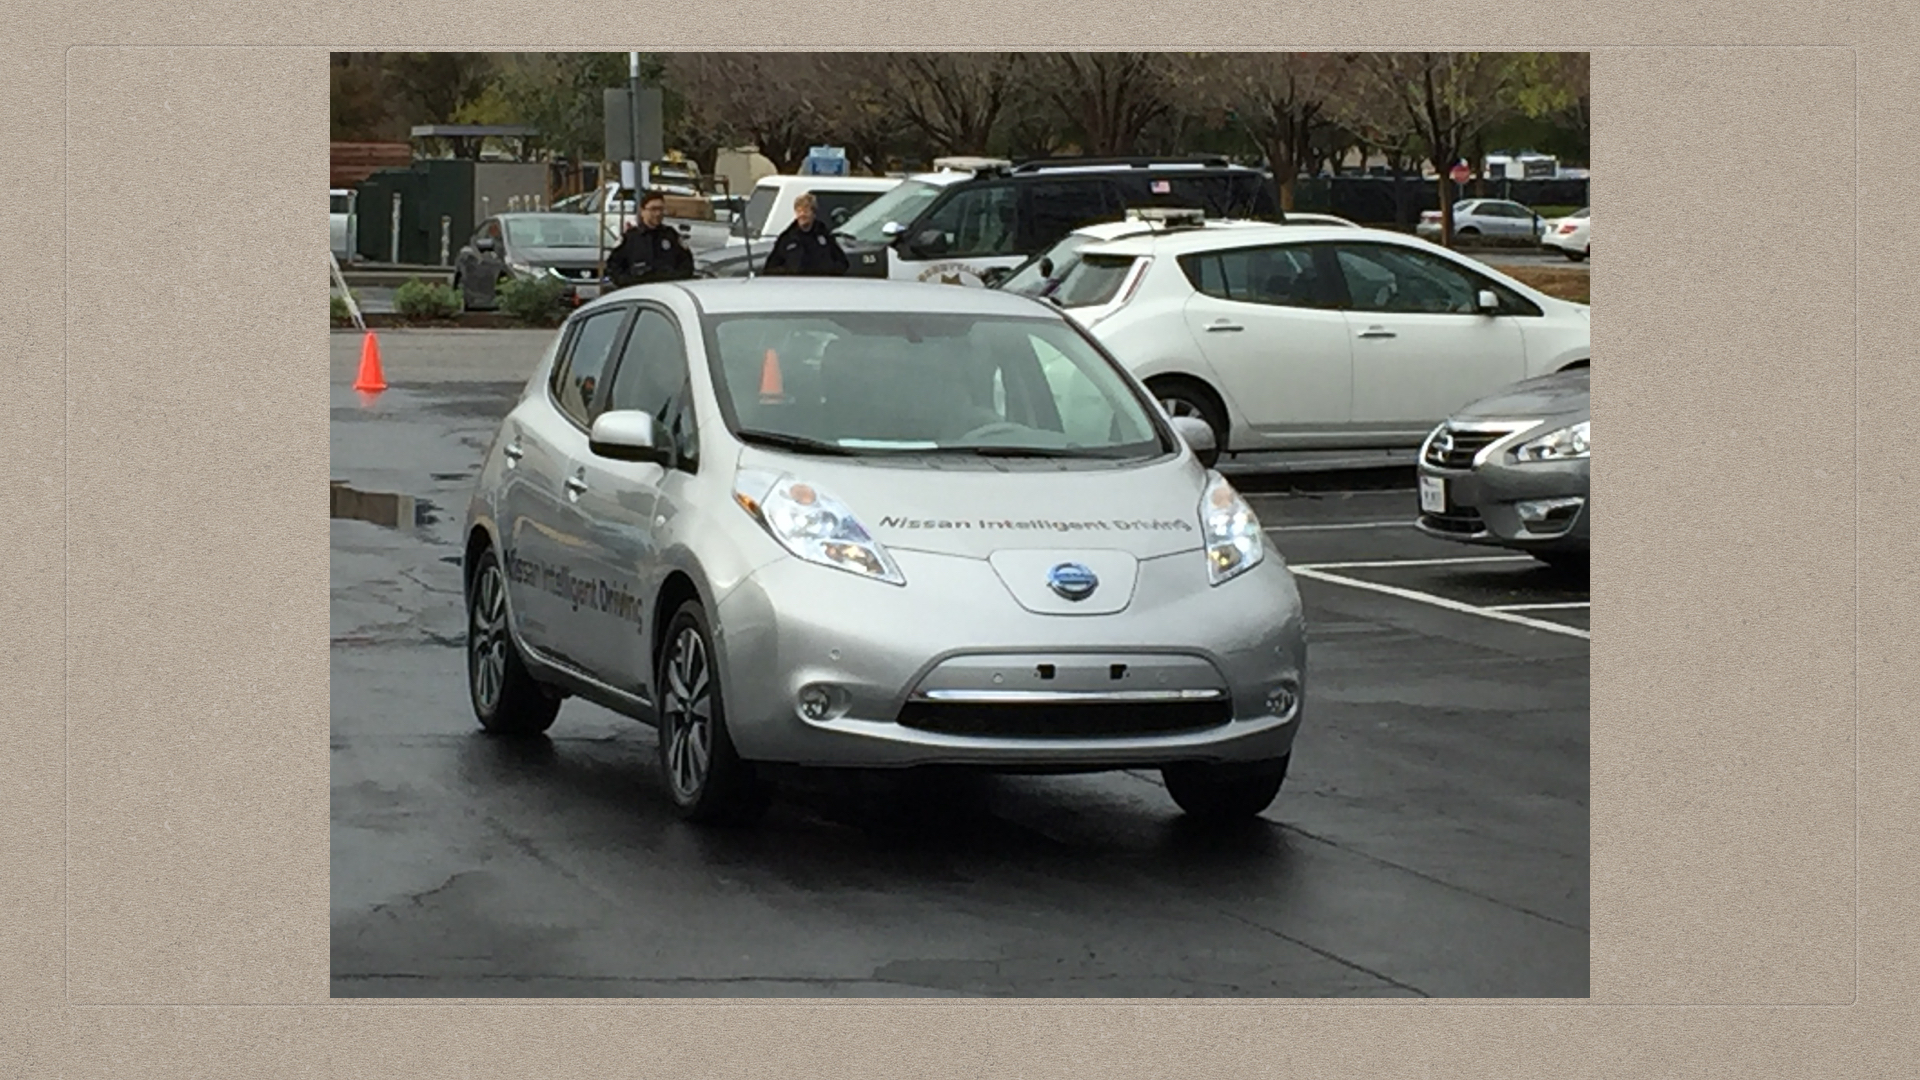 02-06-Nissan Car in the rain